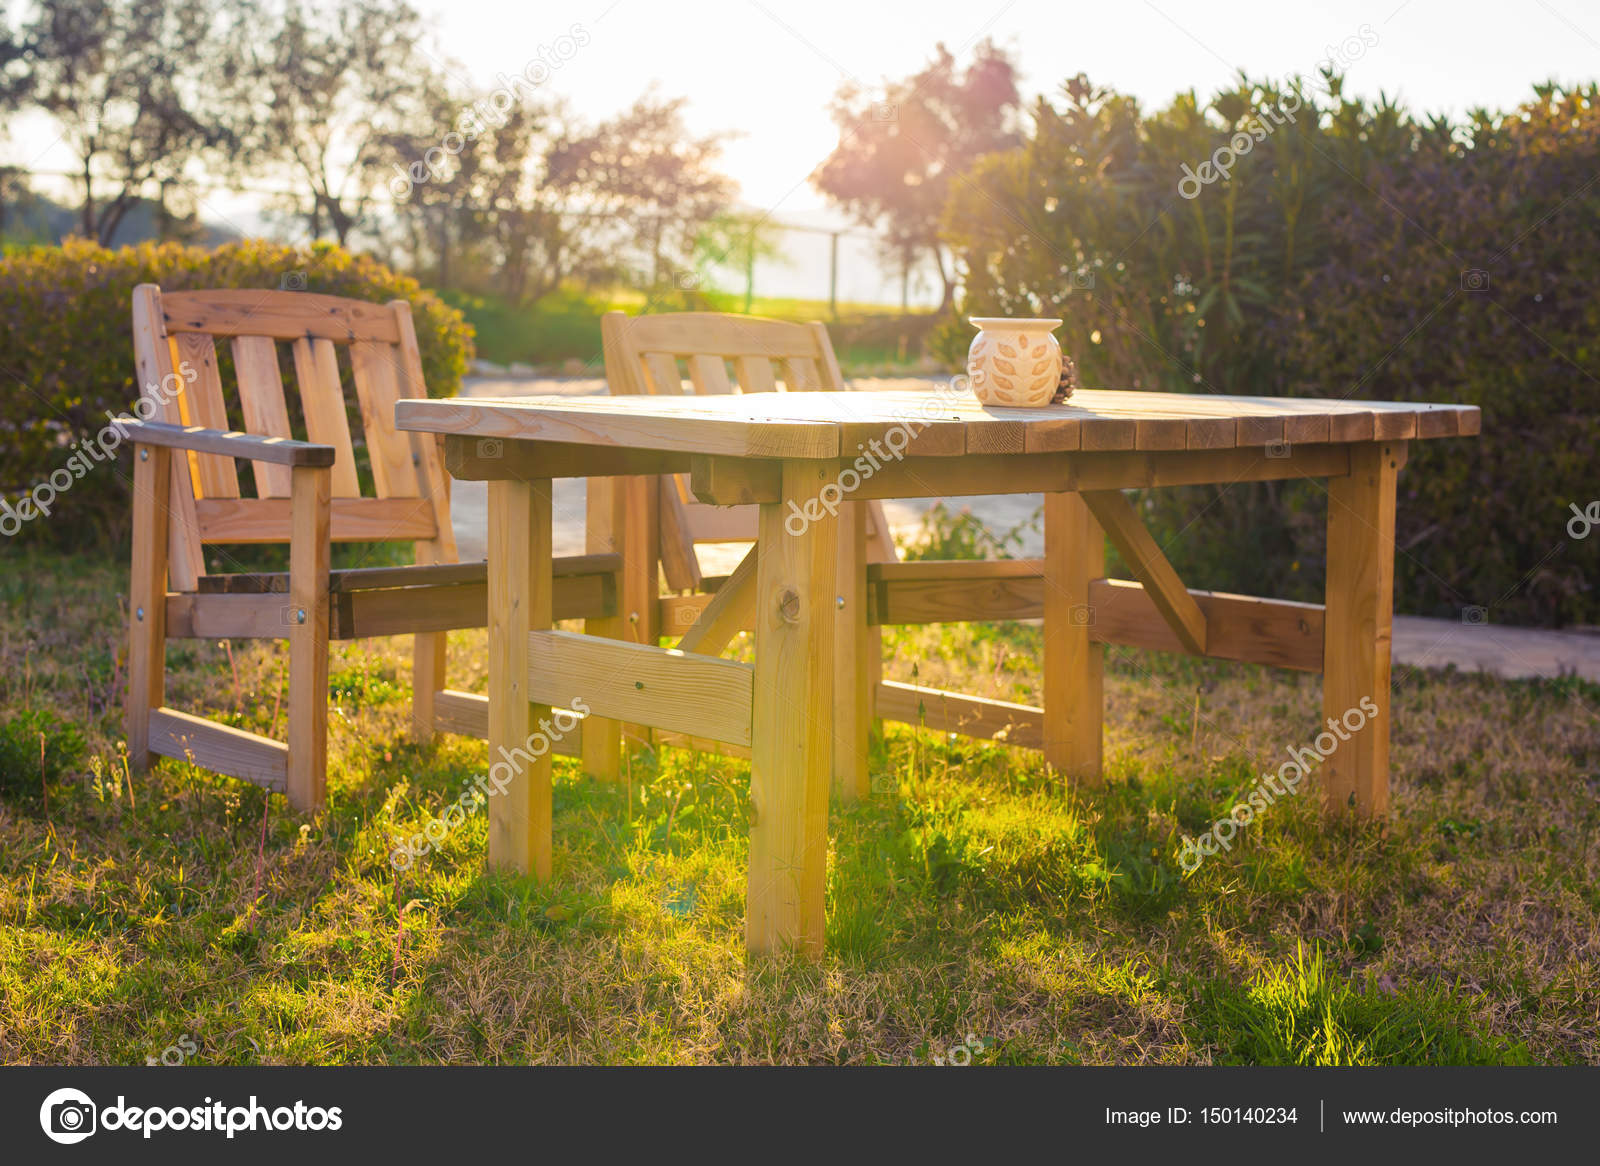 Tuin Lounge Stoel : Houten tuinmeubilair lounge stoelen in de tuin van het hotel